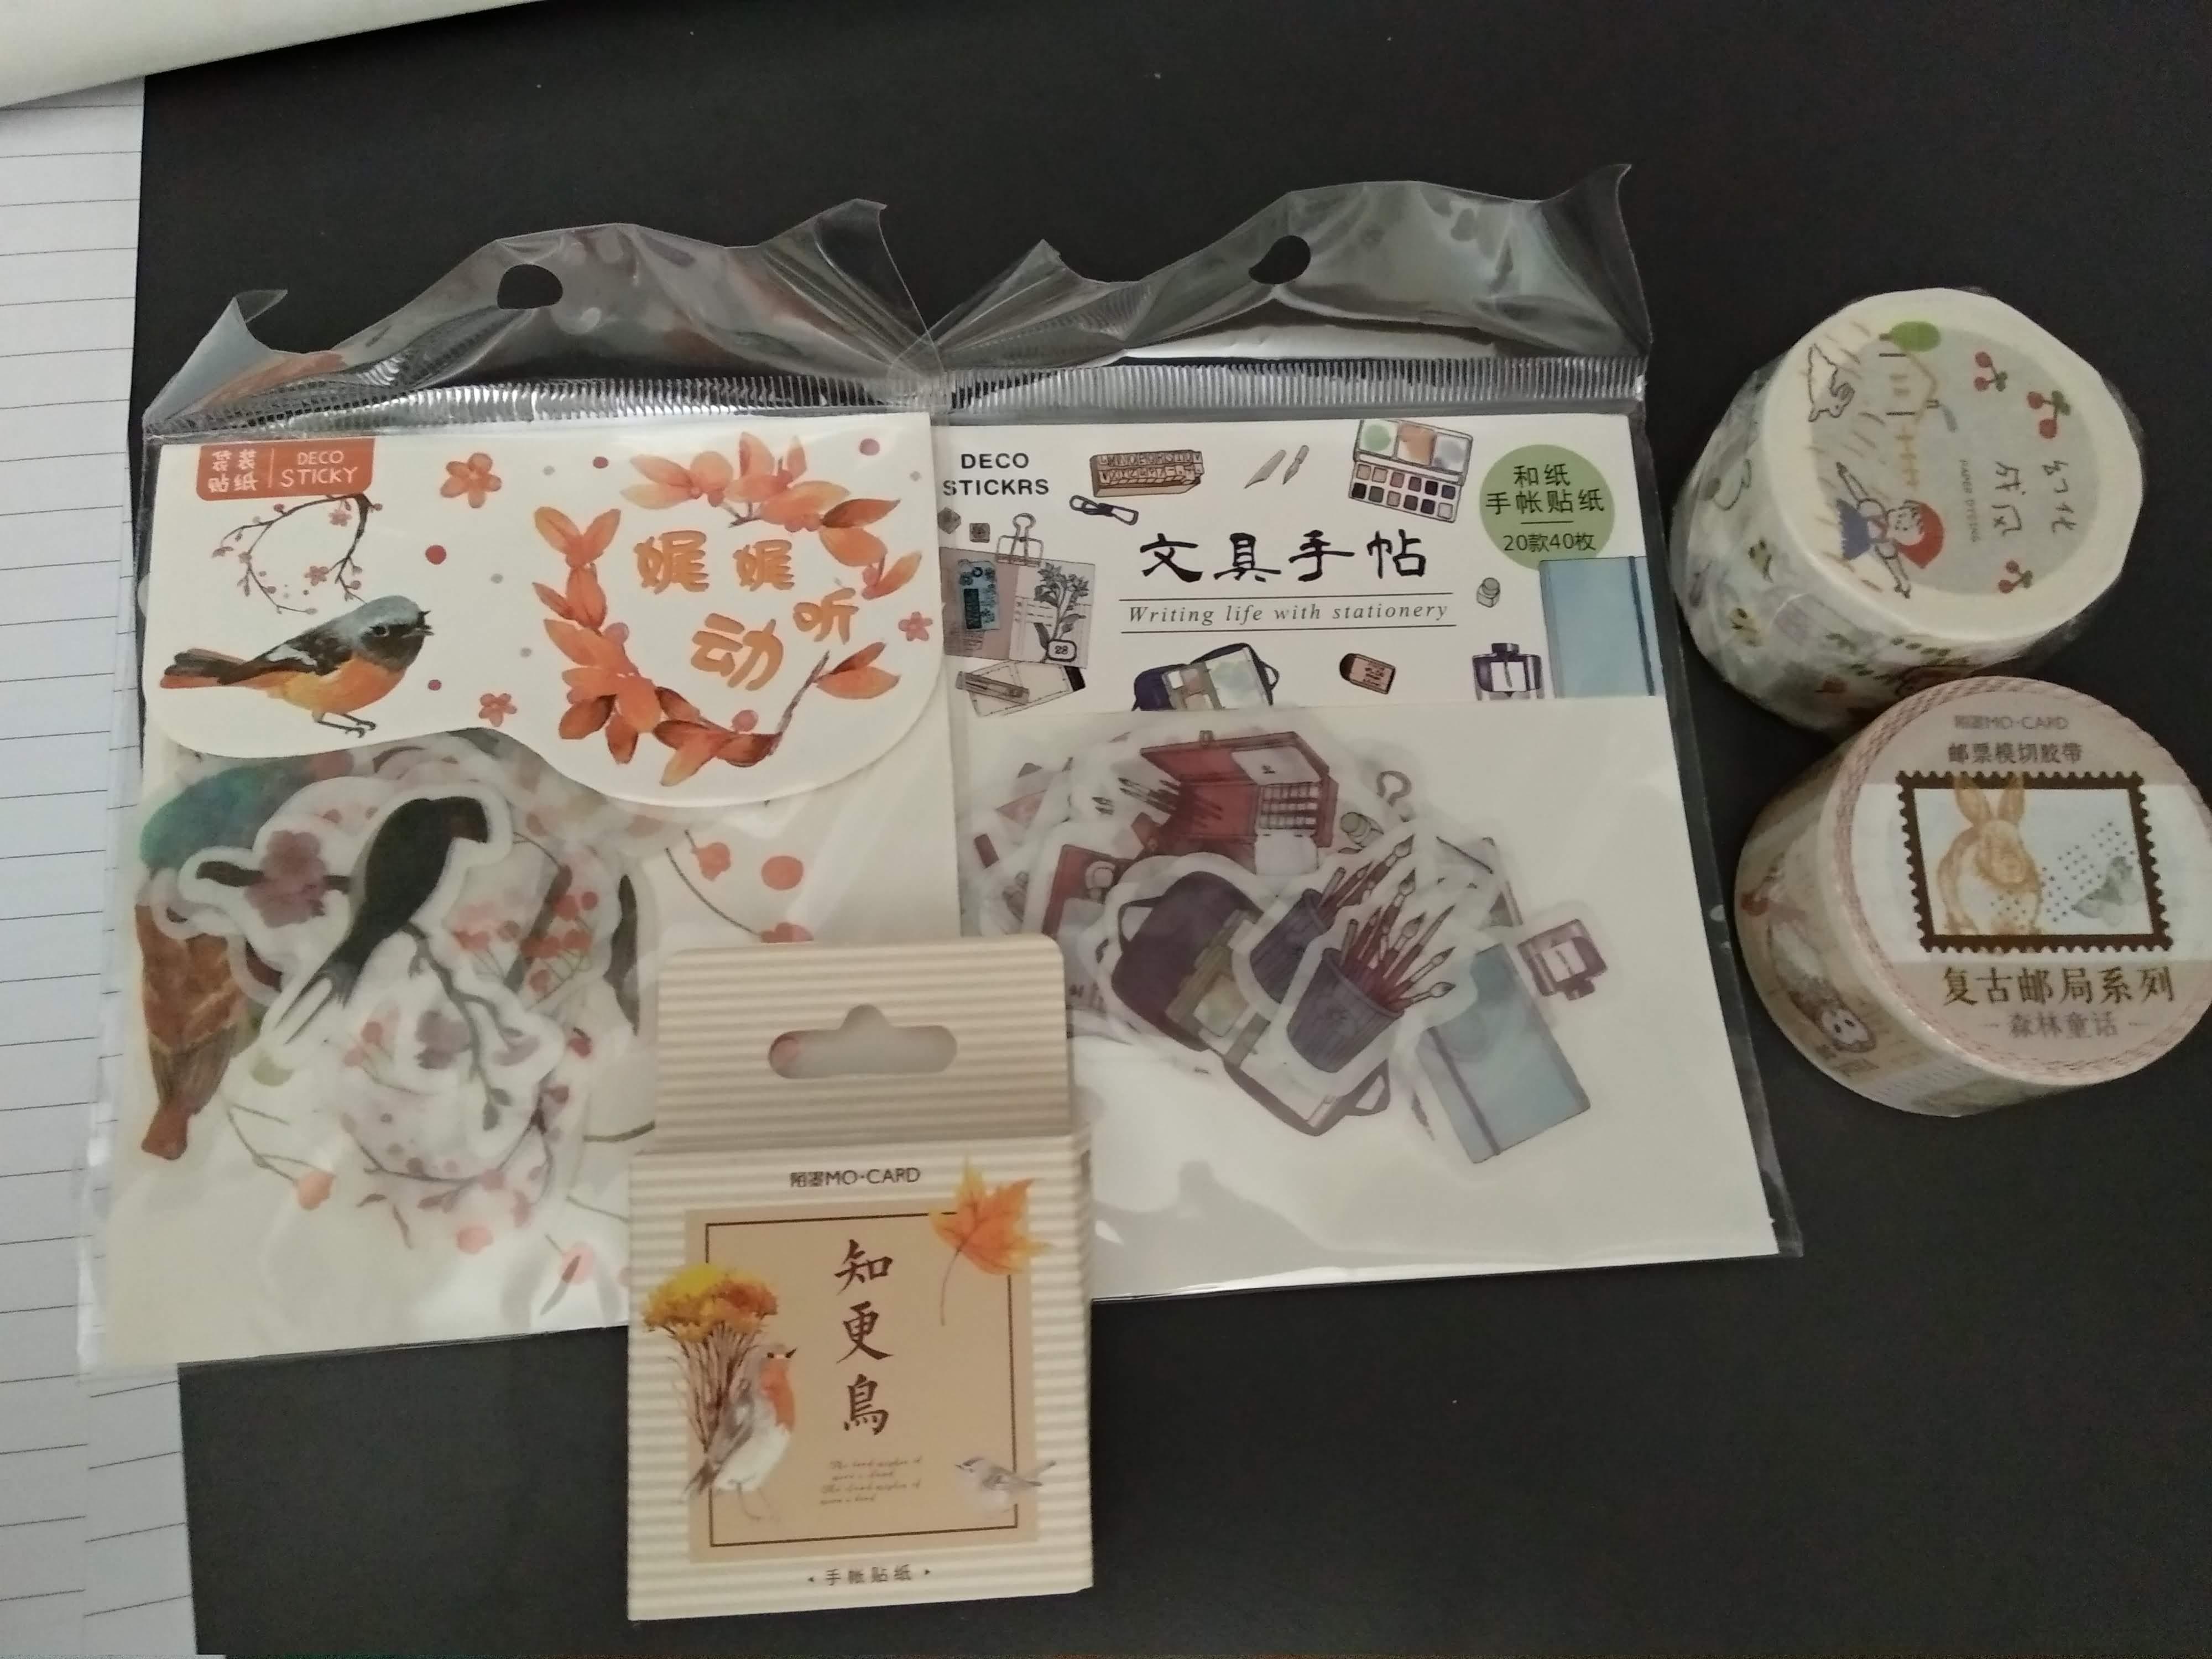 fpn_1580976185__stickers_washi.jpg